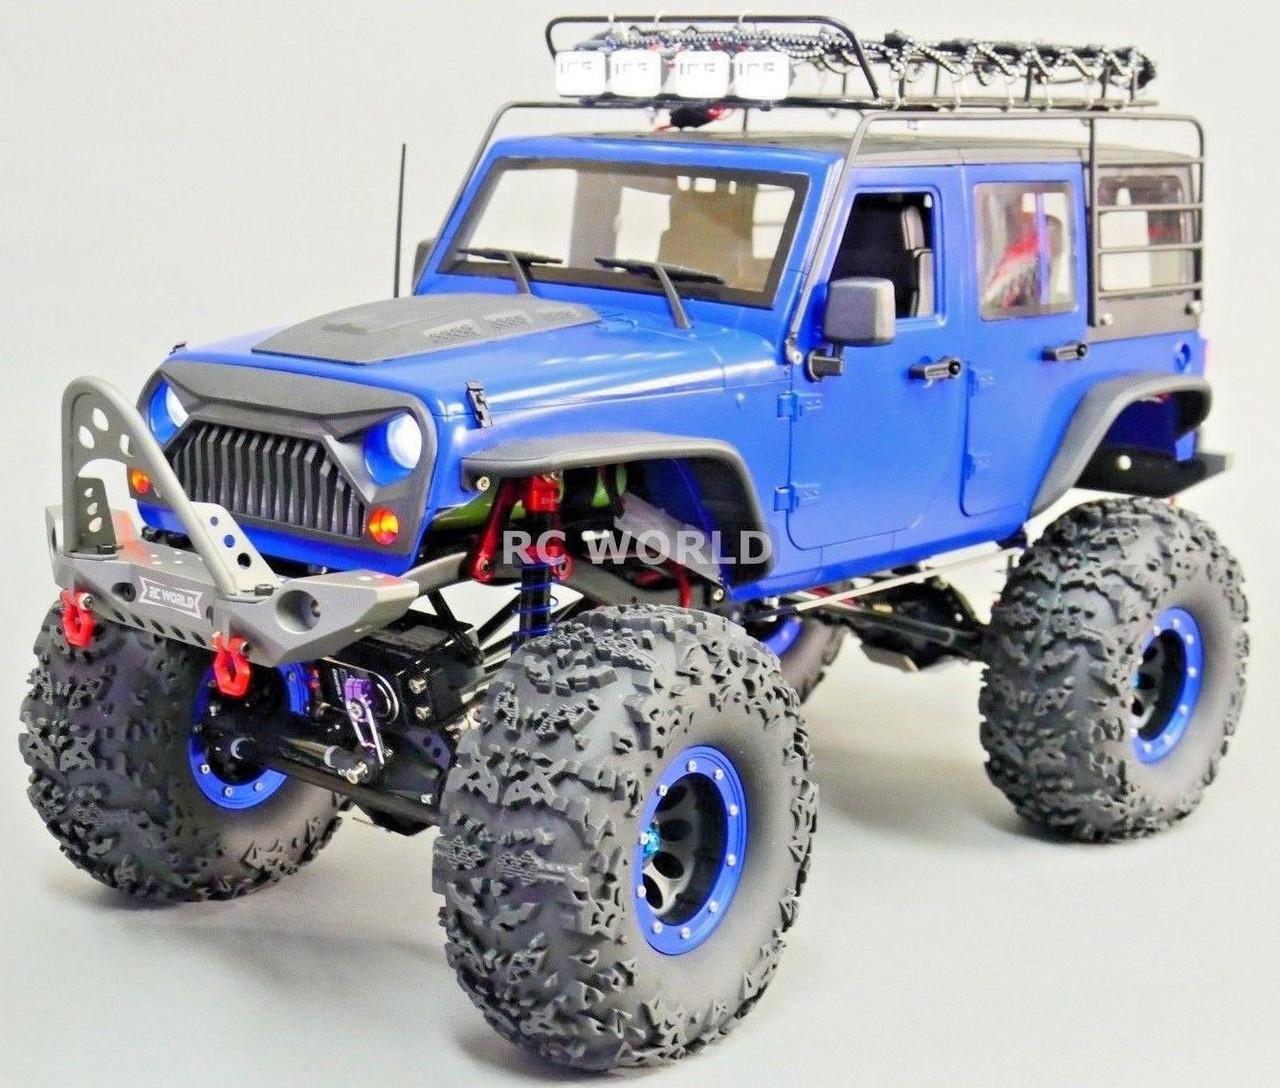 Custom Jeep Rubicon >> Custom Rc Jeep Wrangler 2 2 Rock Crawler 8 4v Single Speed Roof Rack Rtr